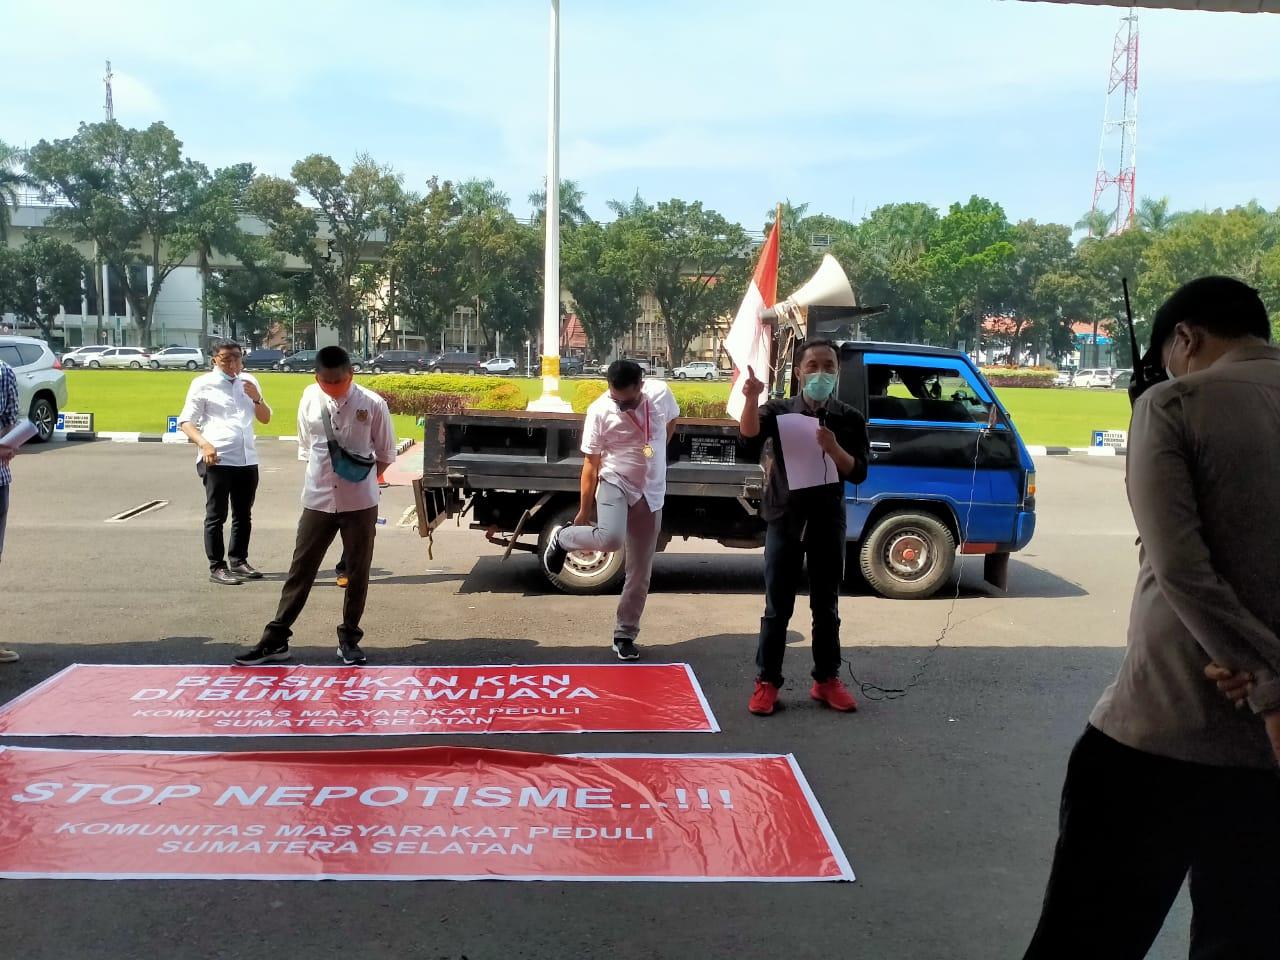 omunitas Masyarakat Peduli Sumatera Selatan (KMPSS), menggelar aksi damai terkait dugaan Korupsi Kolusi Nepotisme (KKN) pada Gubernur Sumatera Selatan (Sumsel) Herman Deru, di depan kantor Pemerintah Provinsi (Pemprov) Sumsel, Rabu (7/4/2021).